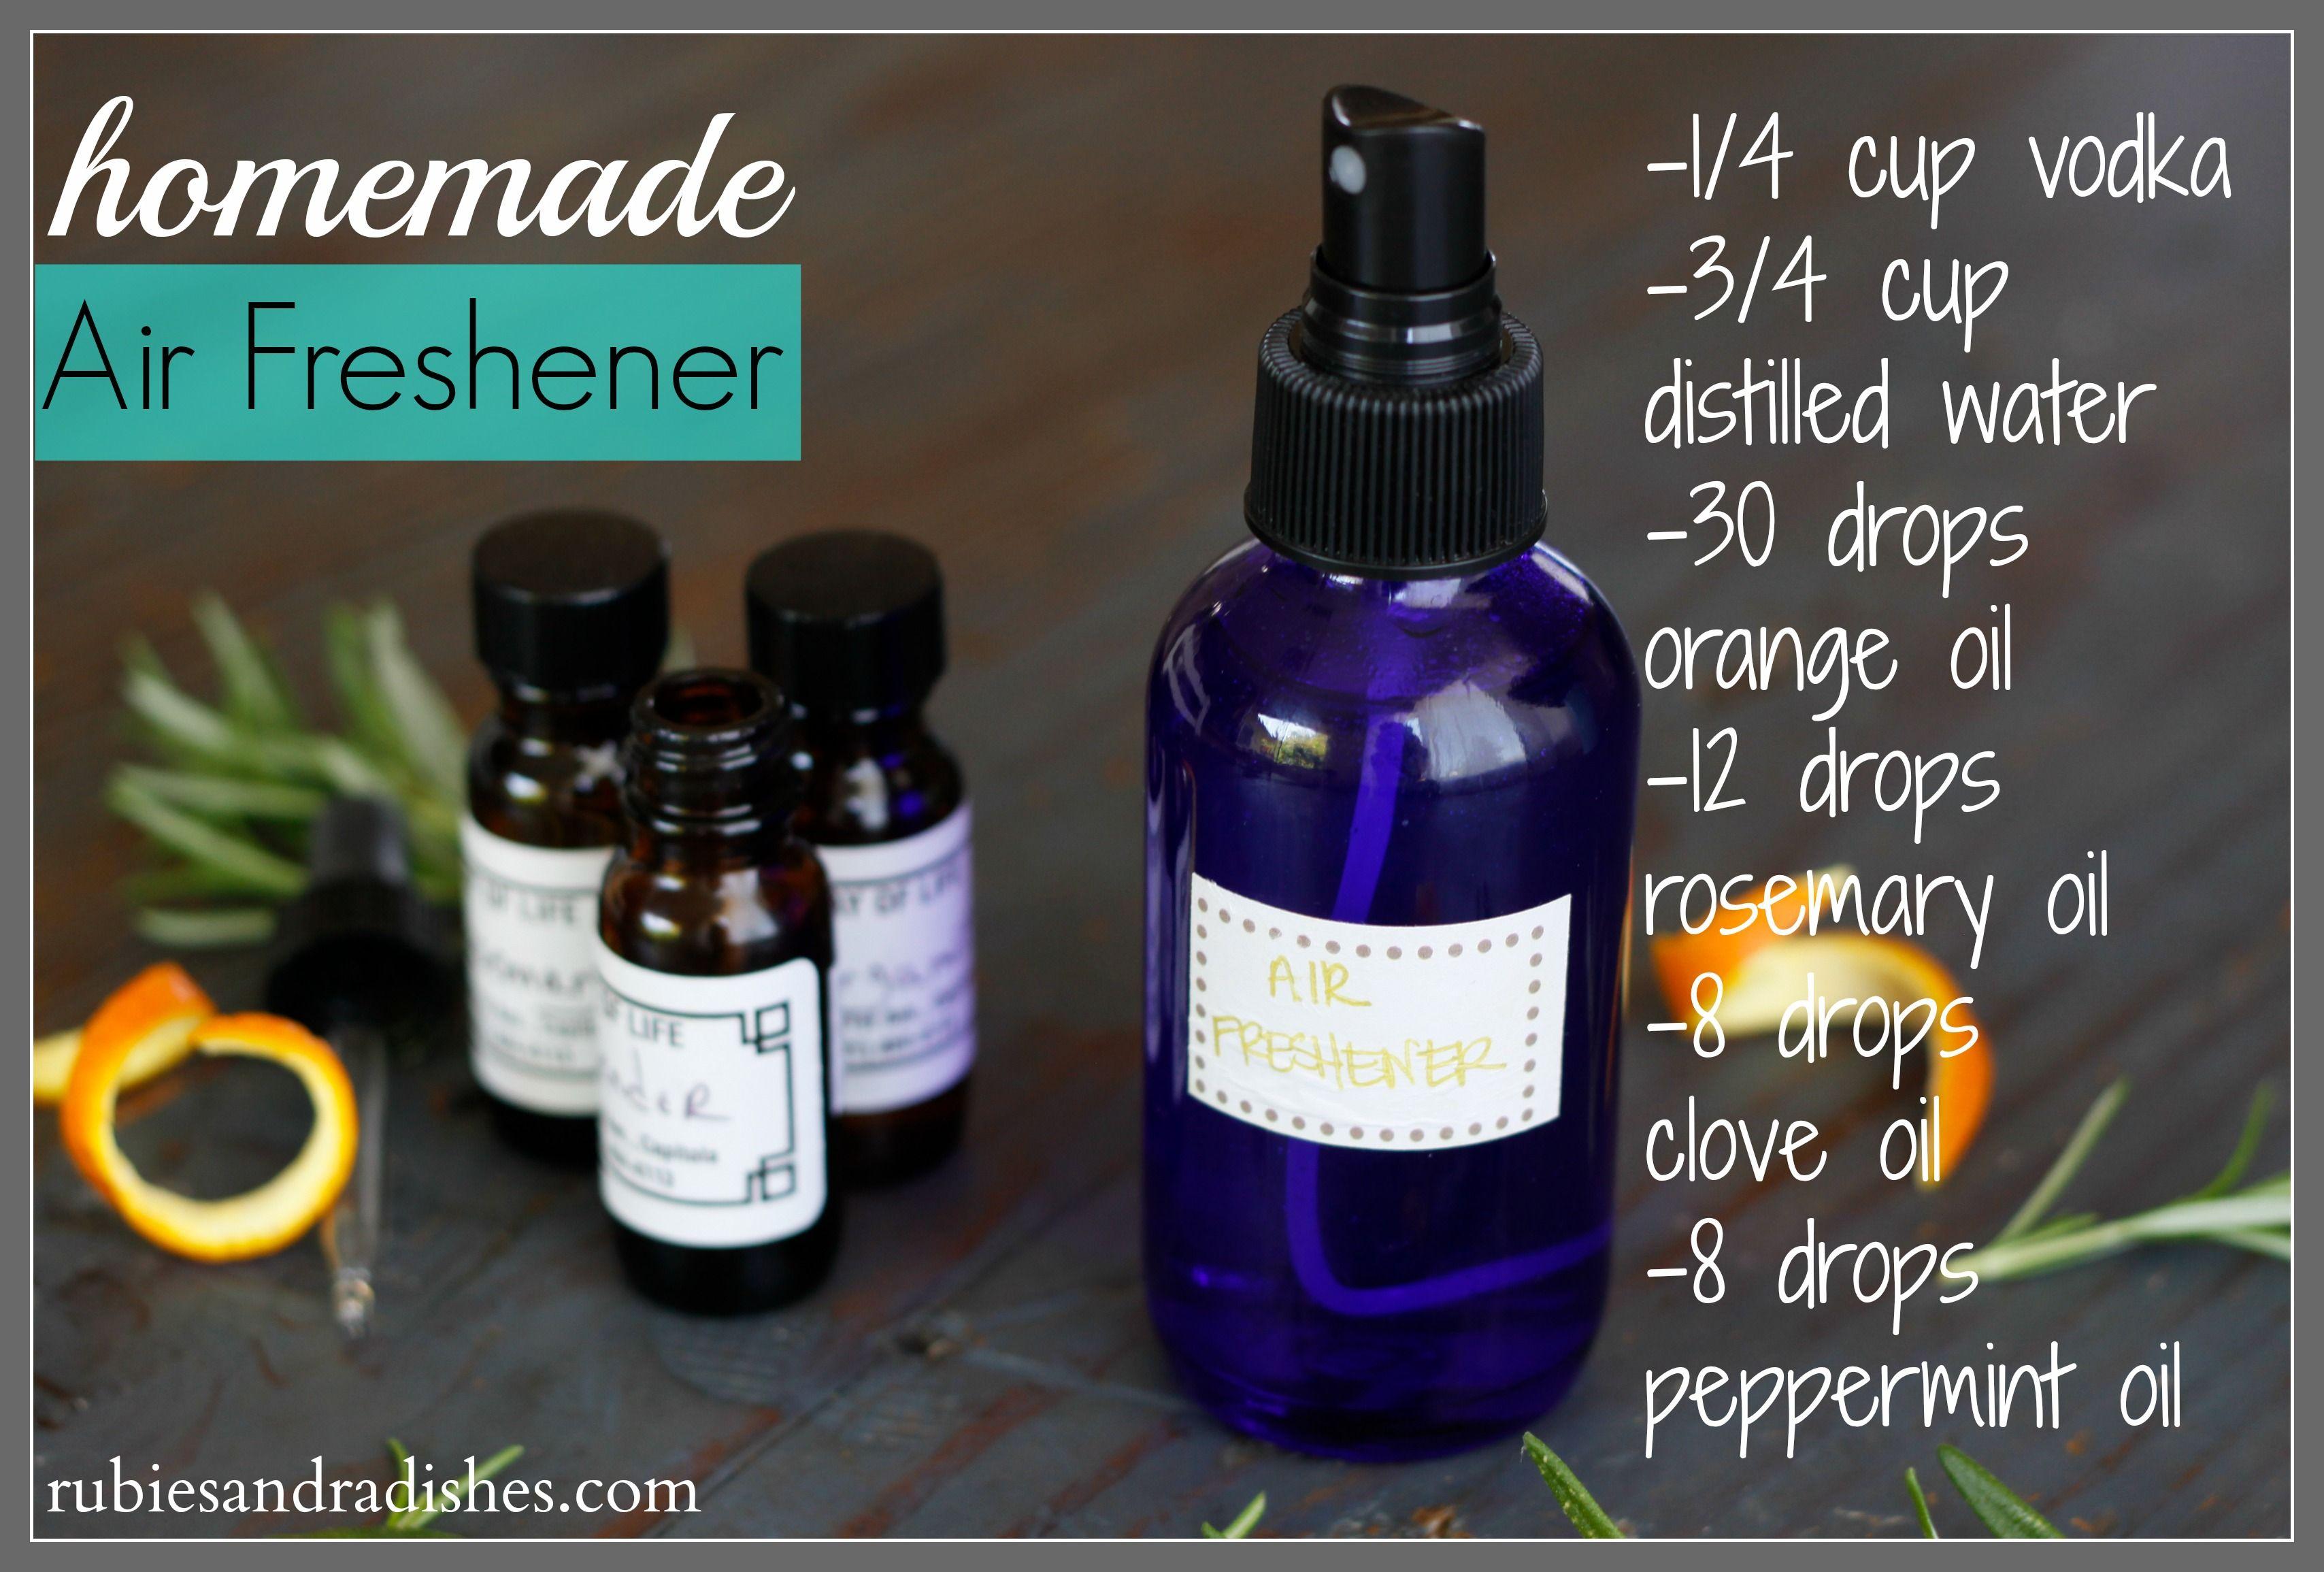 Homemade AirFreshener 30 drops orange oil (find it here